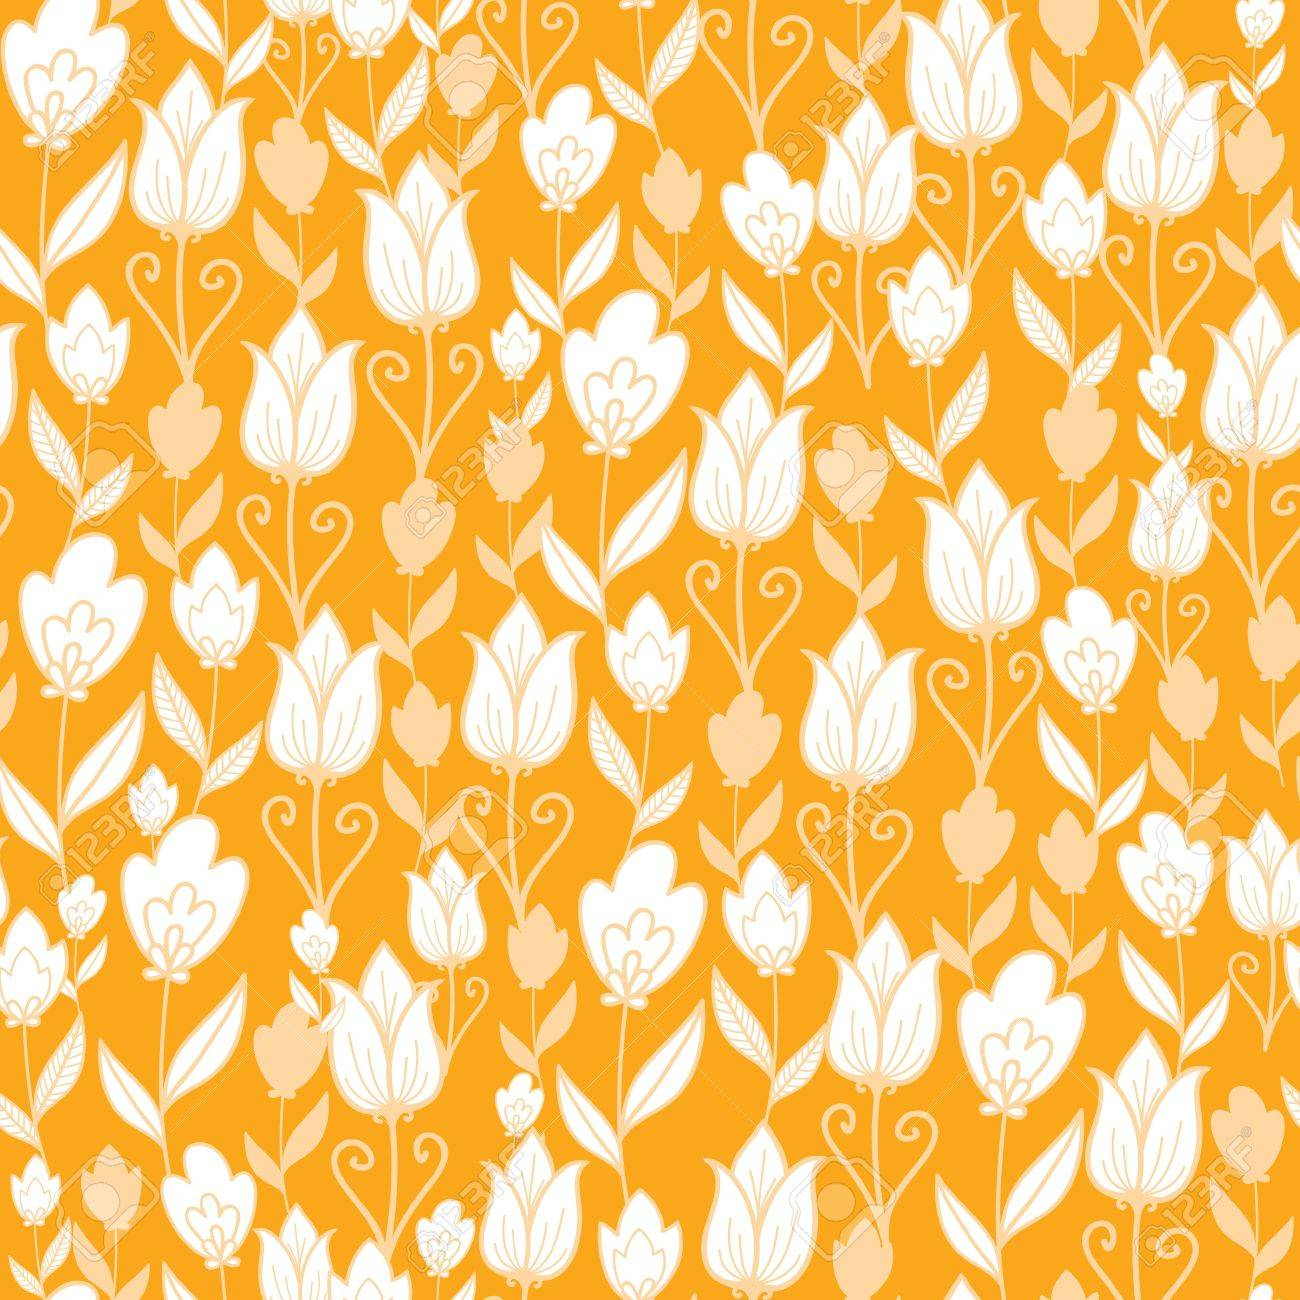 Golden tulips flowers seamless pattern background Stock Vector - 16564782